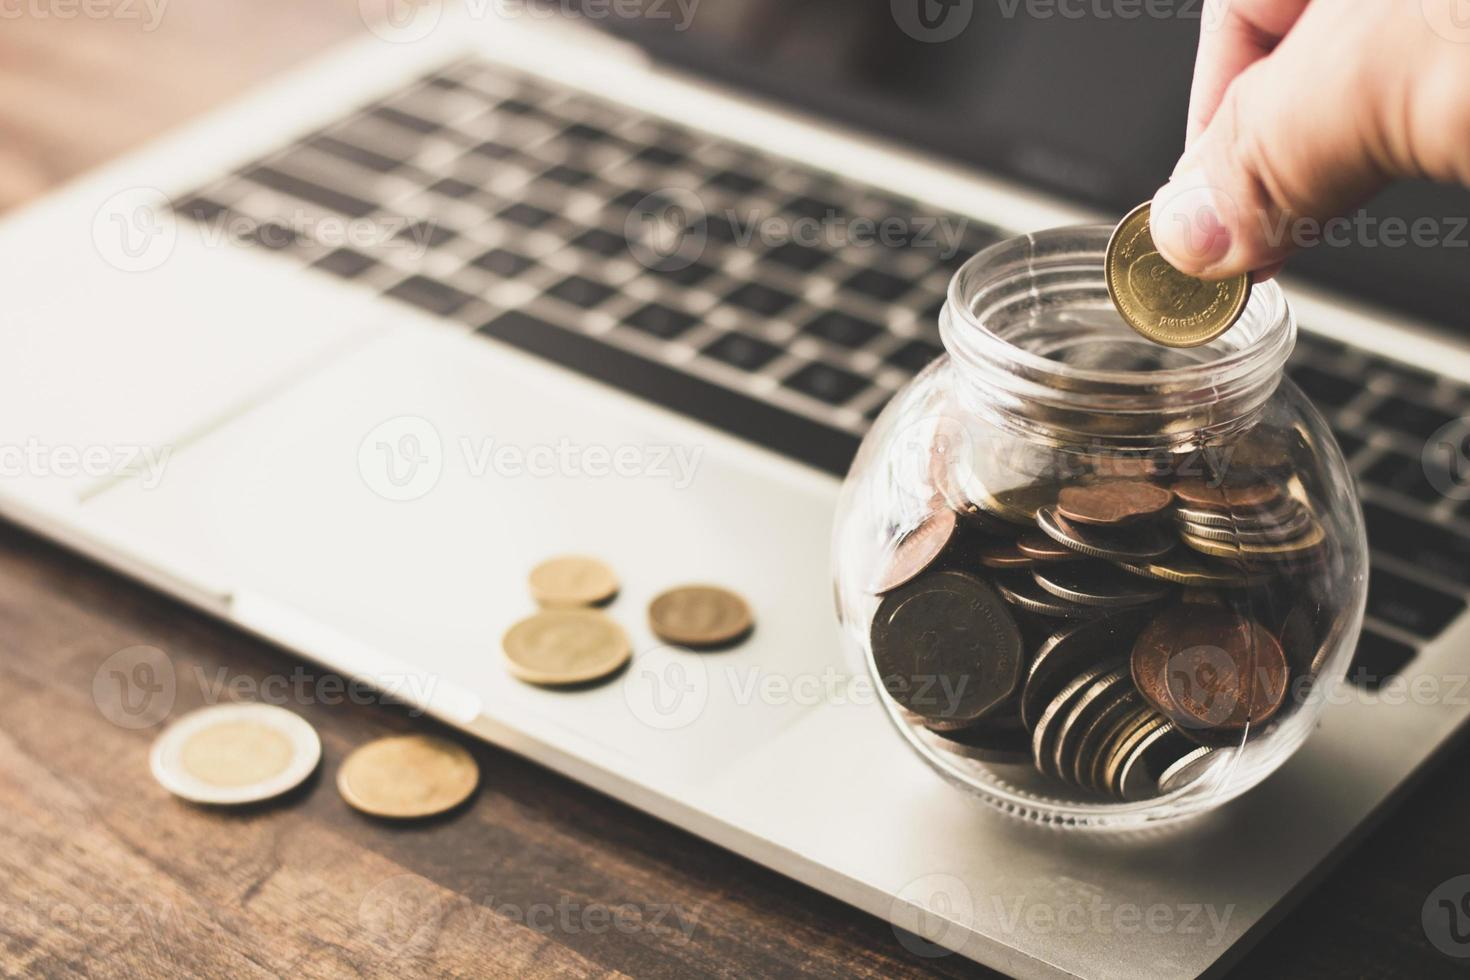 guardar monedas en un frasco foto